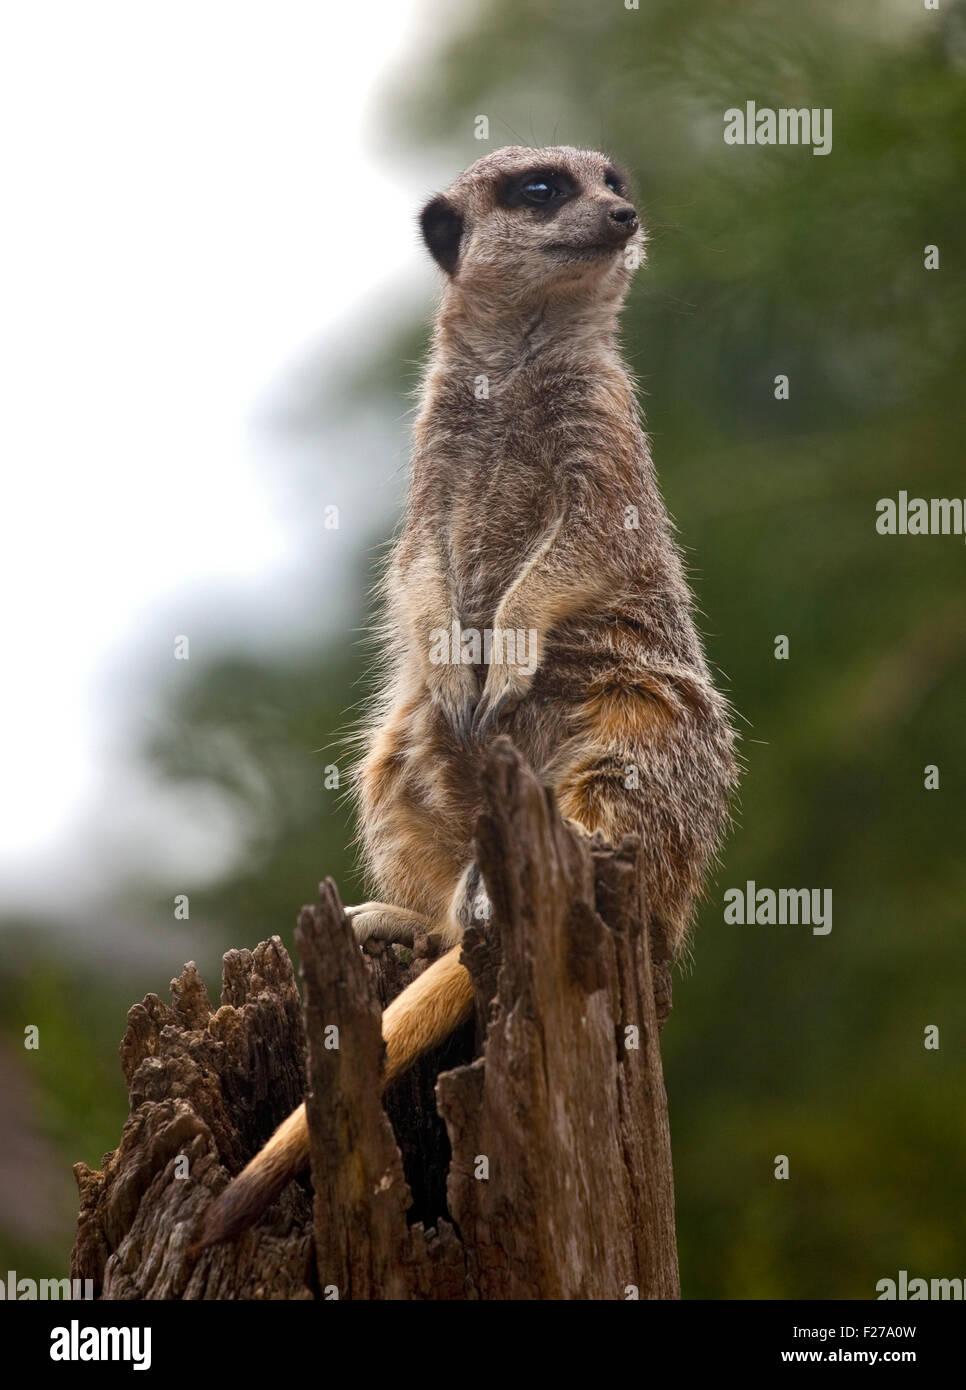 Slender Tailed Meerkat (suricata suricatta) - Stock Image